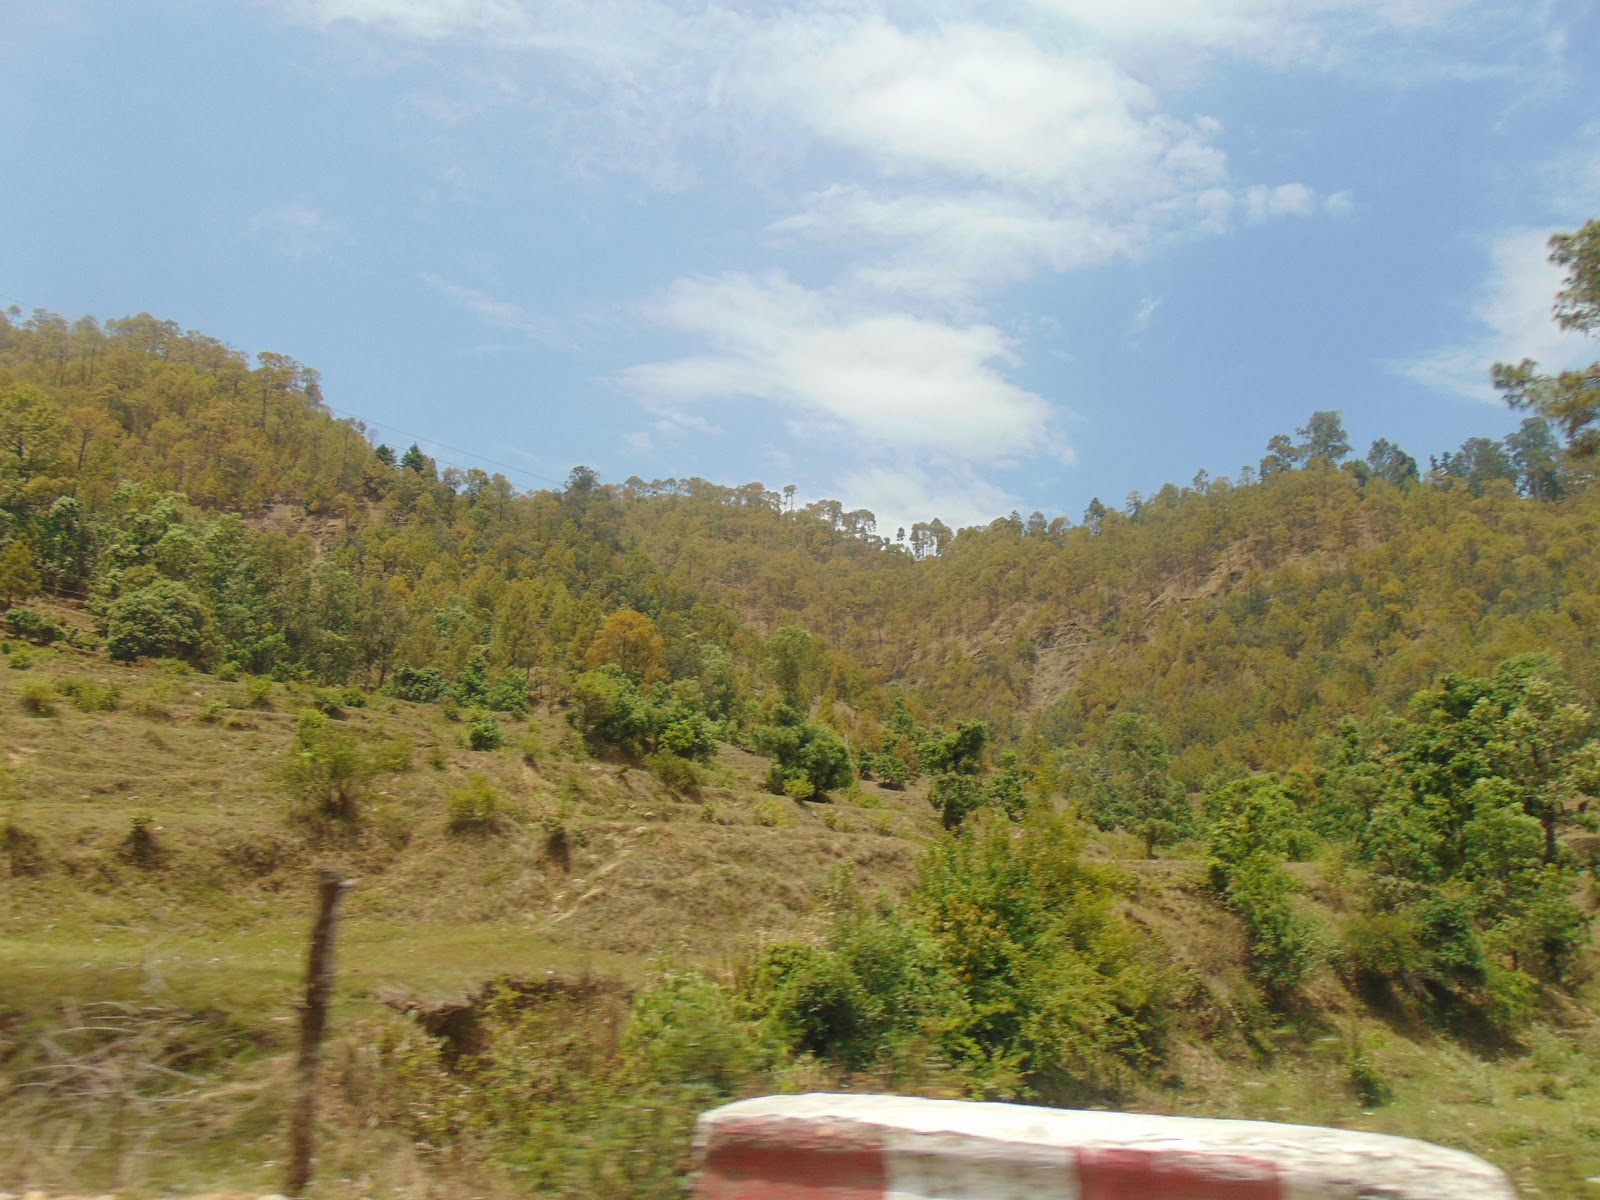 Journey From Kausani to Nainital via Ranikhet - The Nearest Visual Definition of Breathtaking